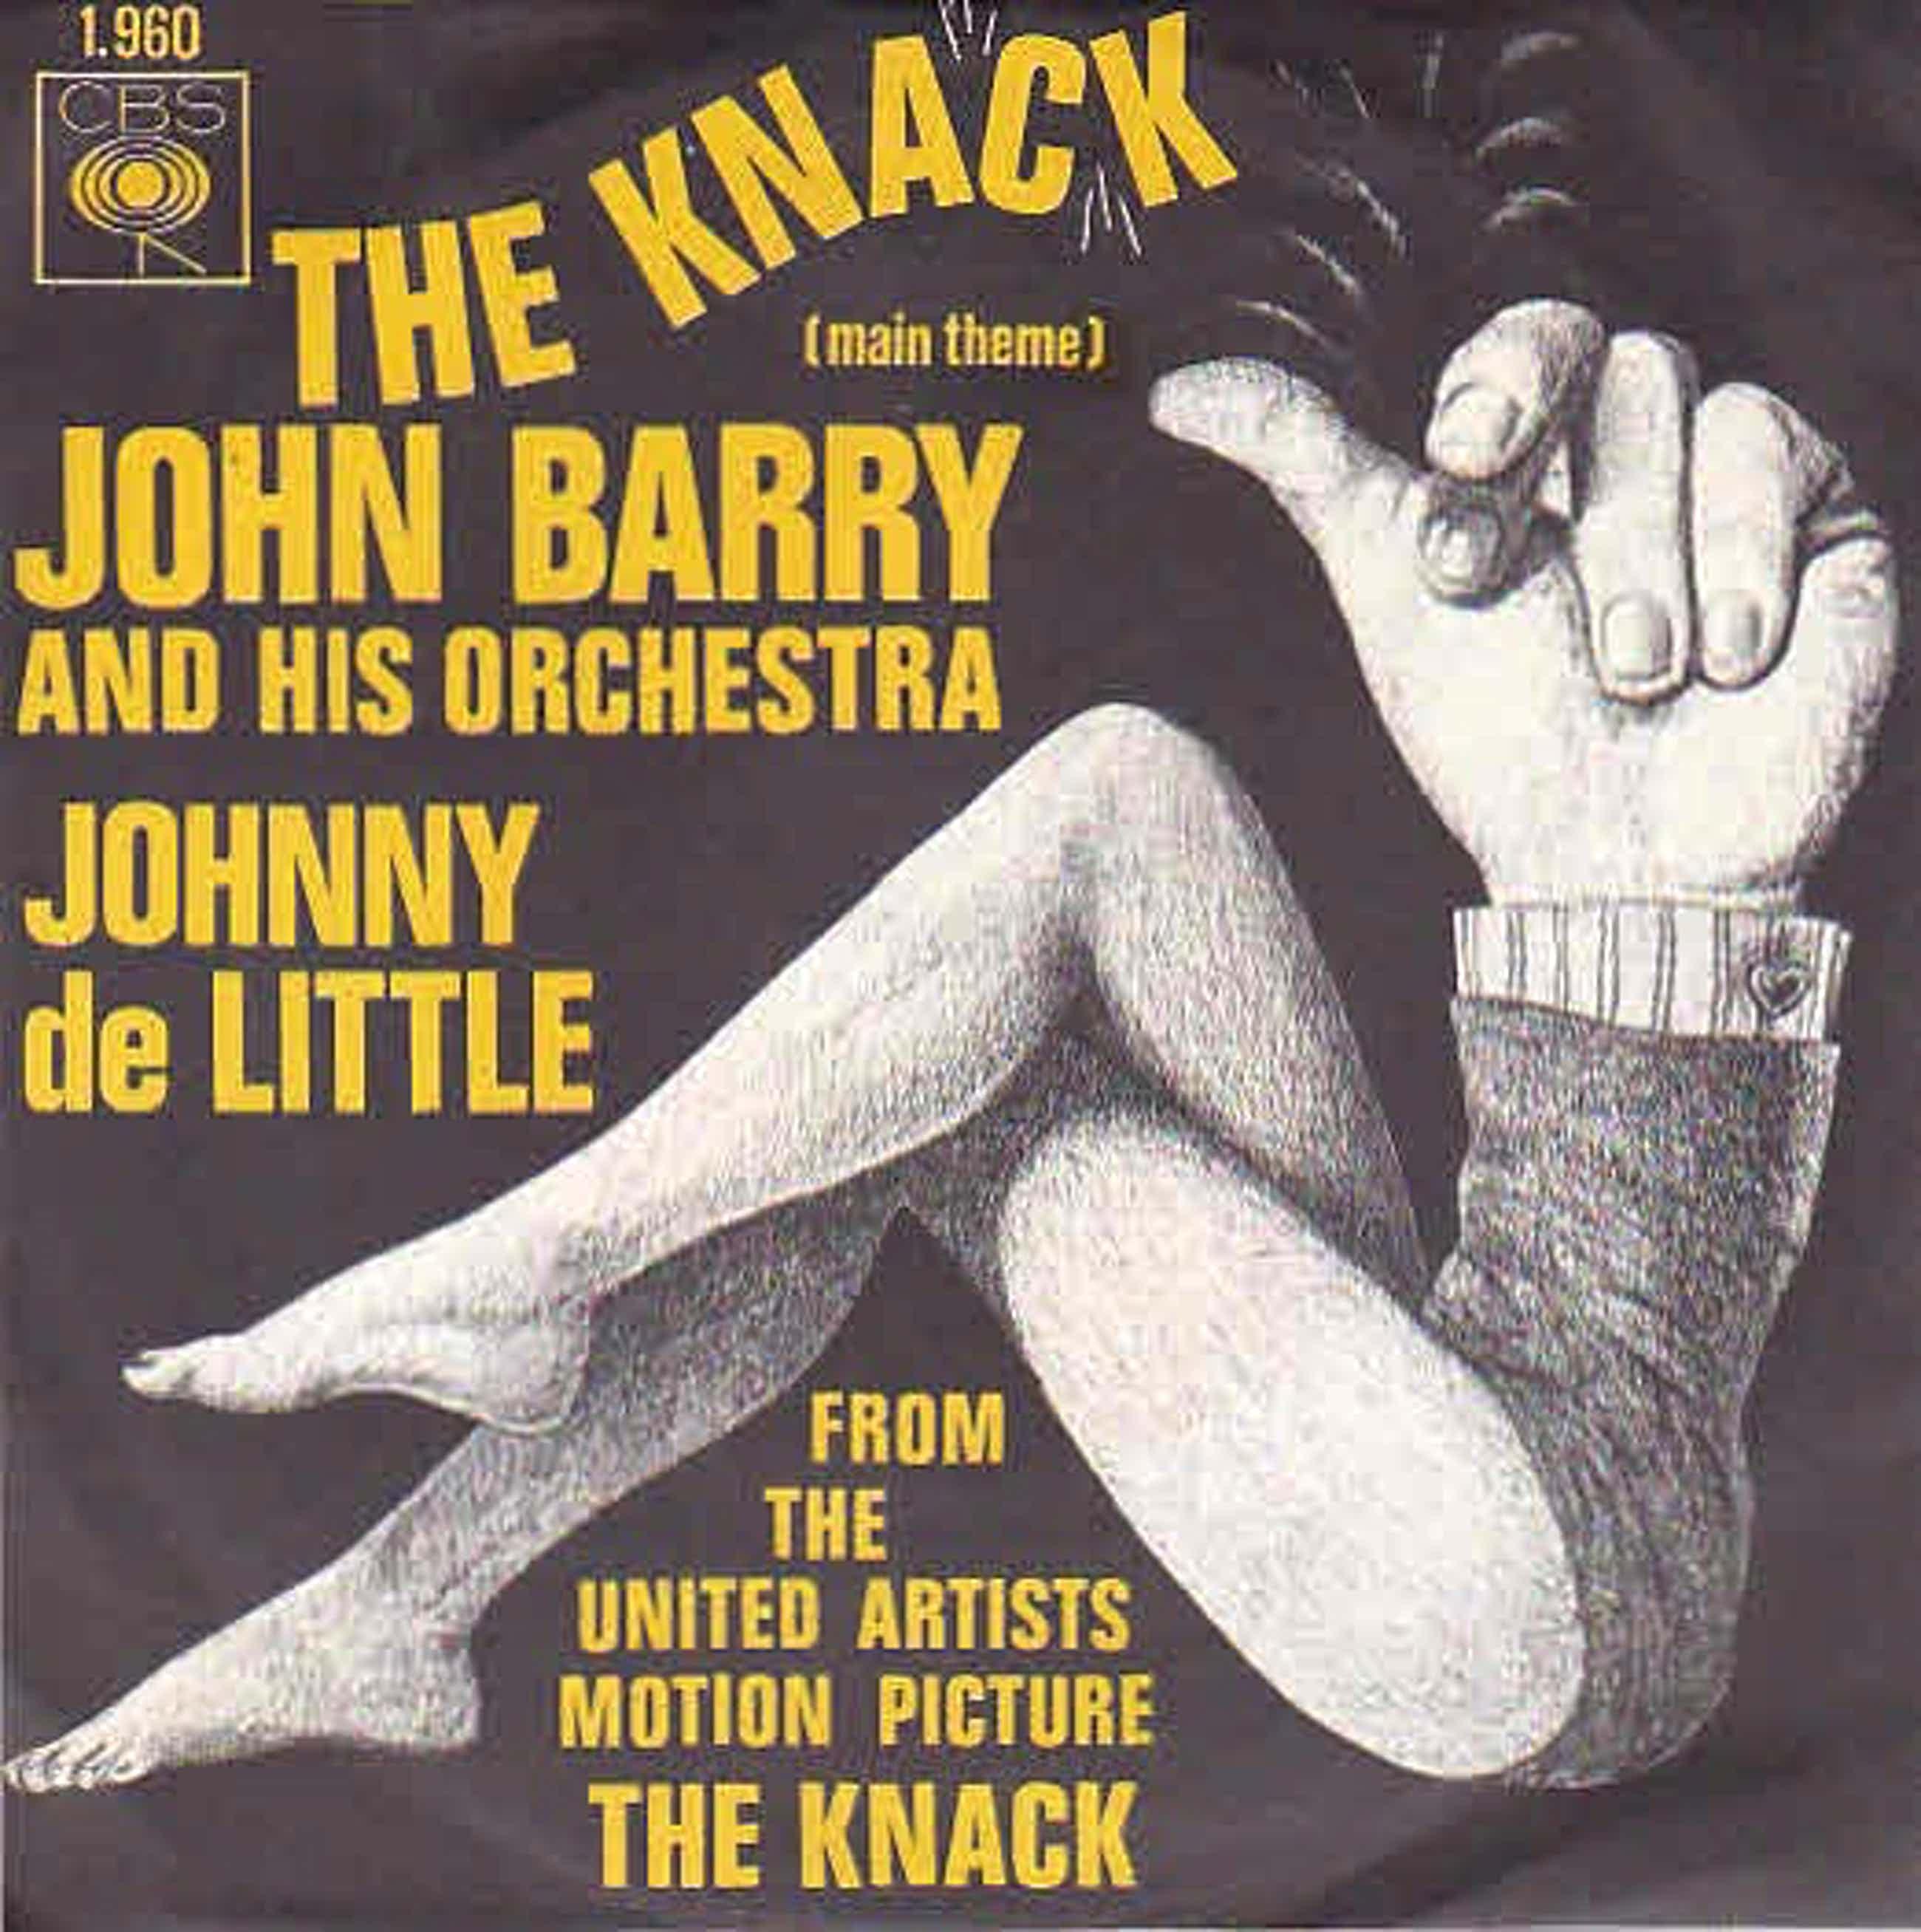 John Barry - Lot van 2 singles: The Knack, A man Alone kopen? Bied vanaf 10!